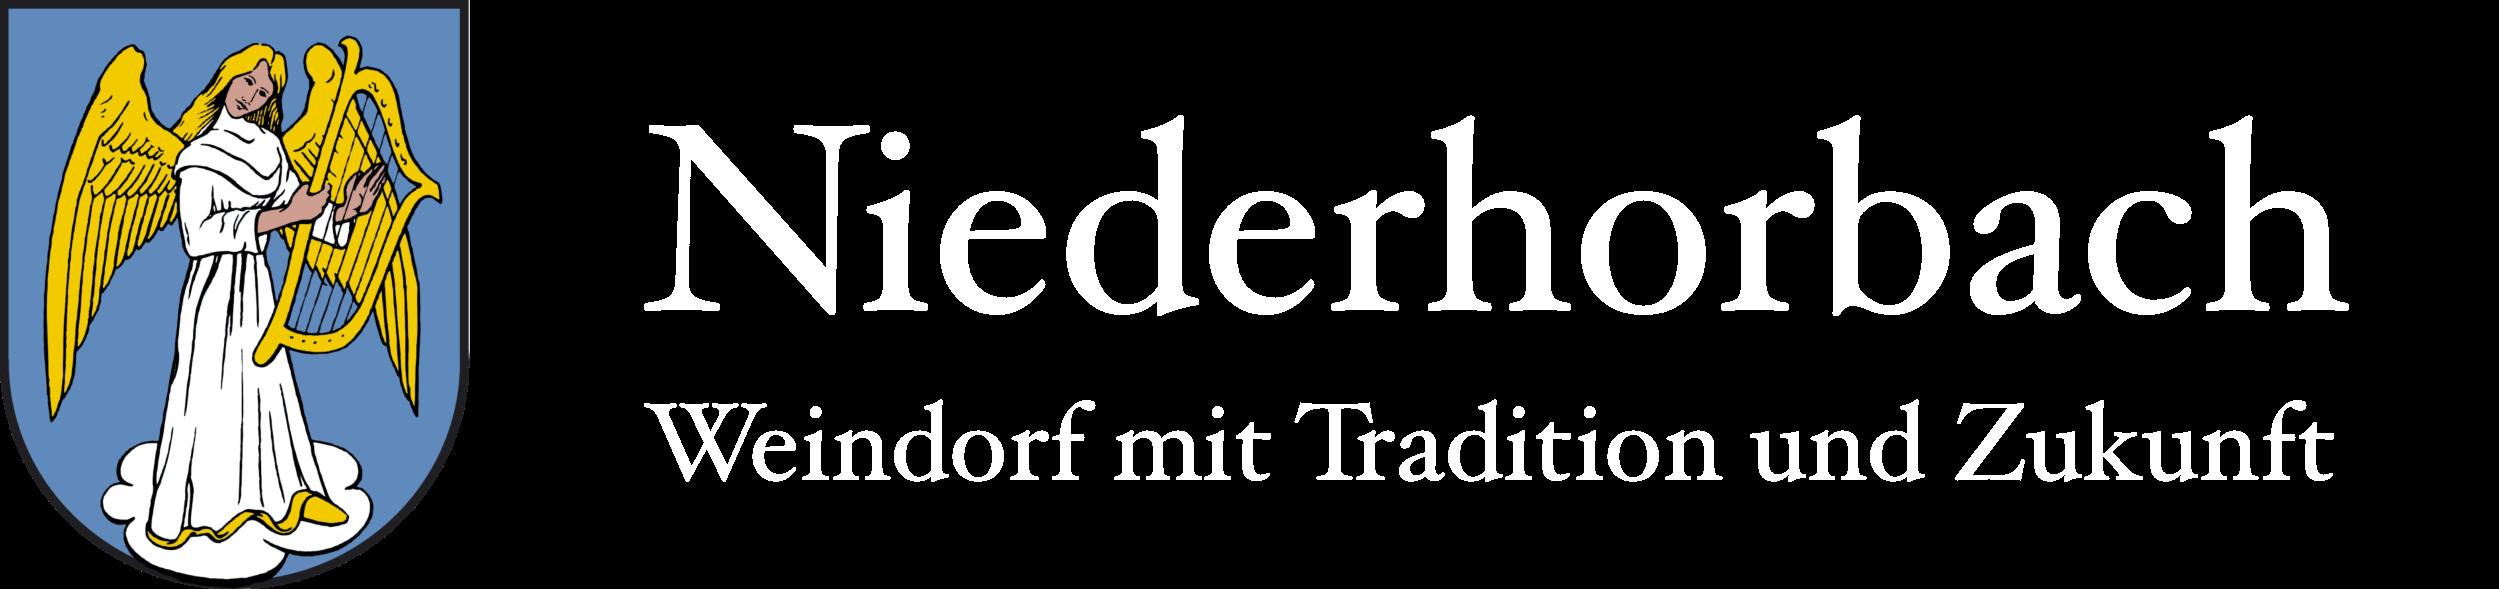 Logo Niederhorbach